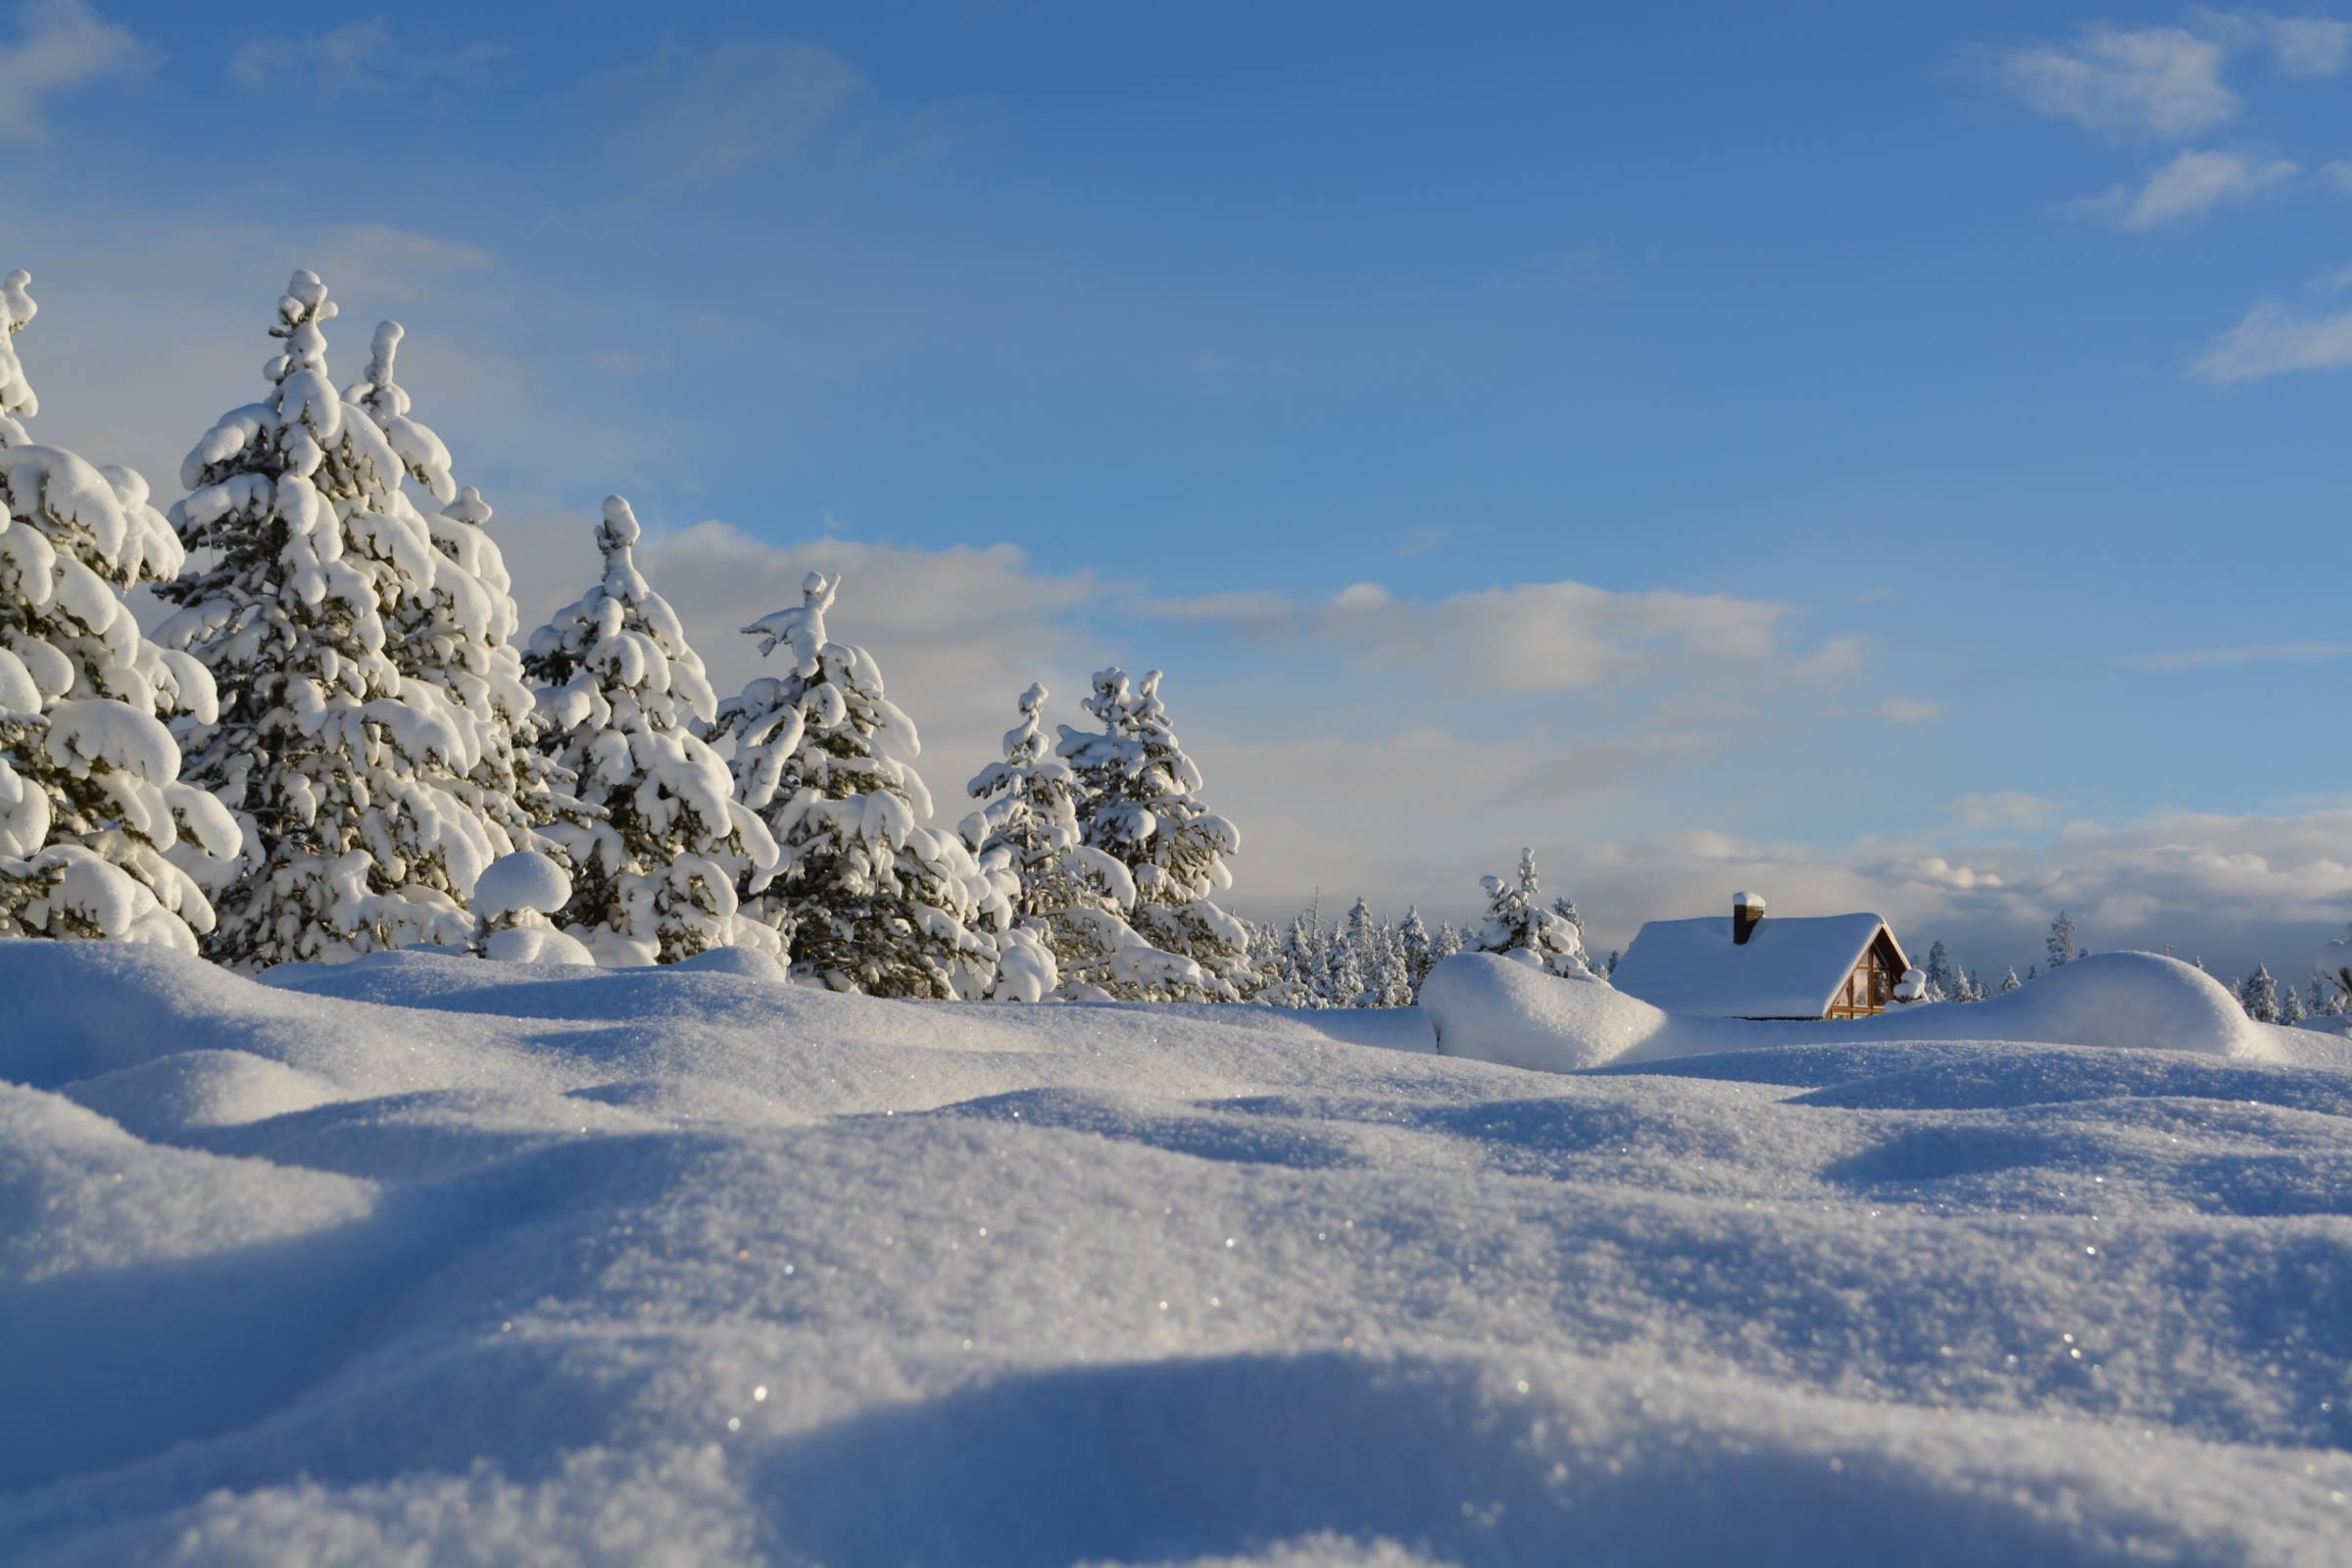 winter snow drift cabin pine trees